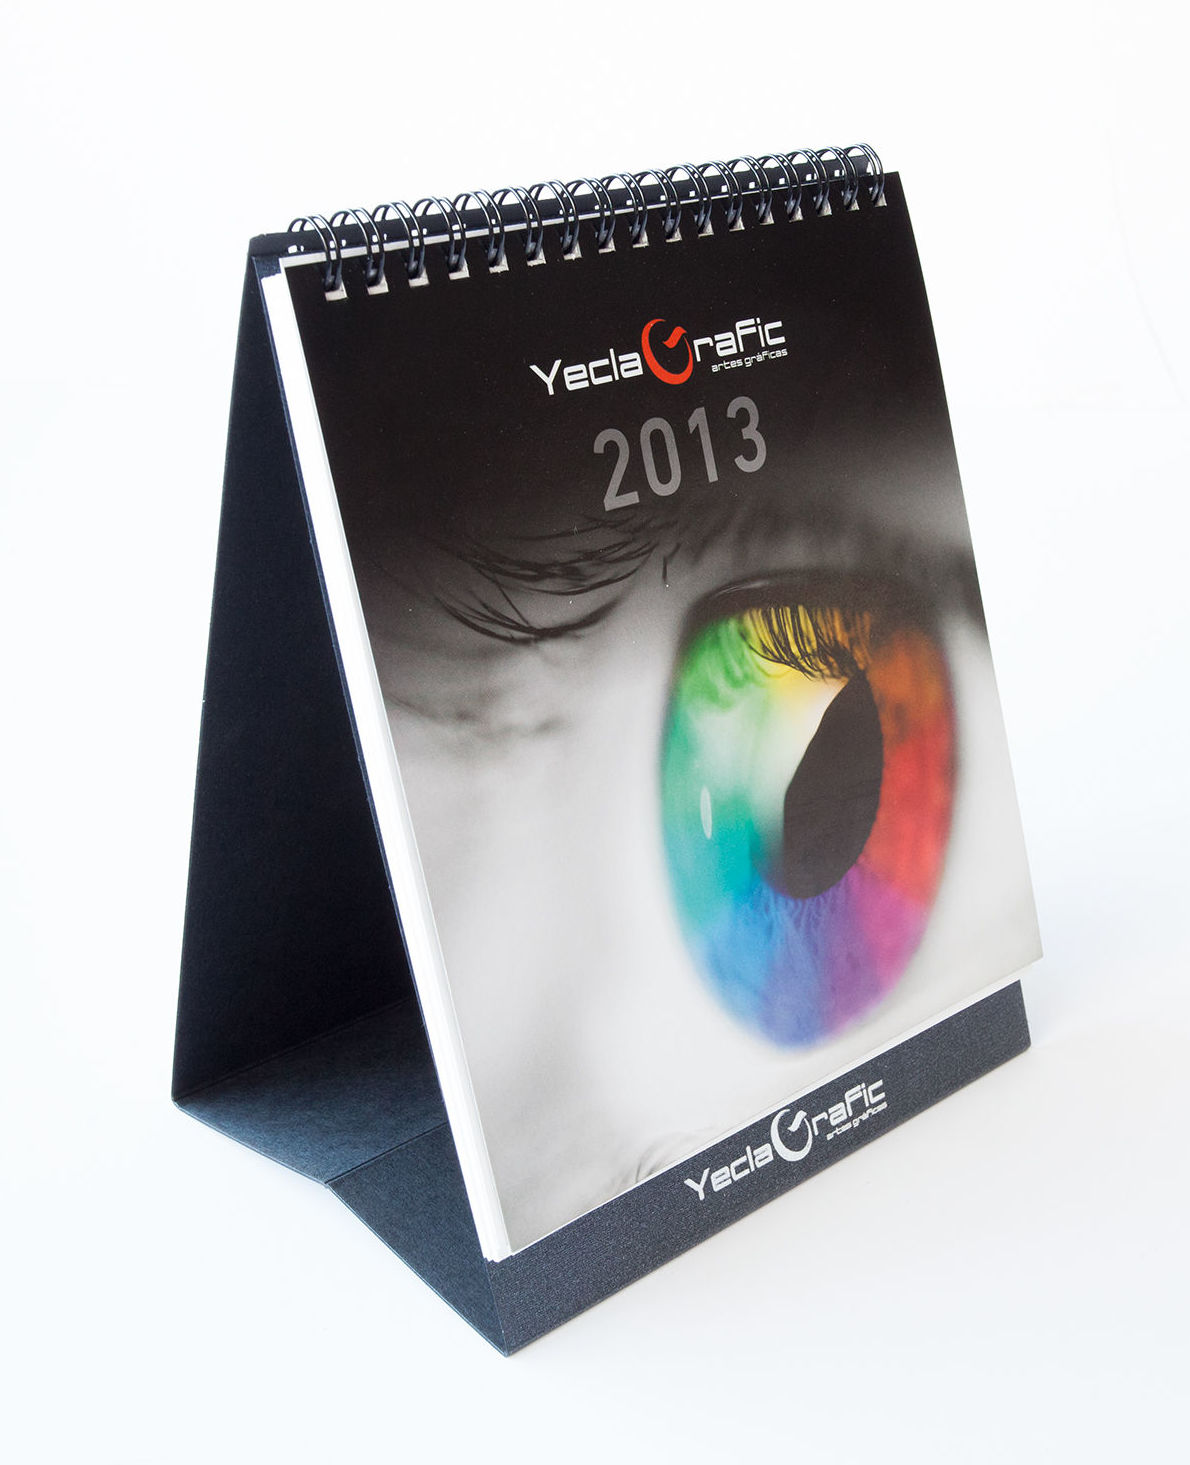 Yeclagrafic, impresión digital Yecla